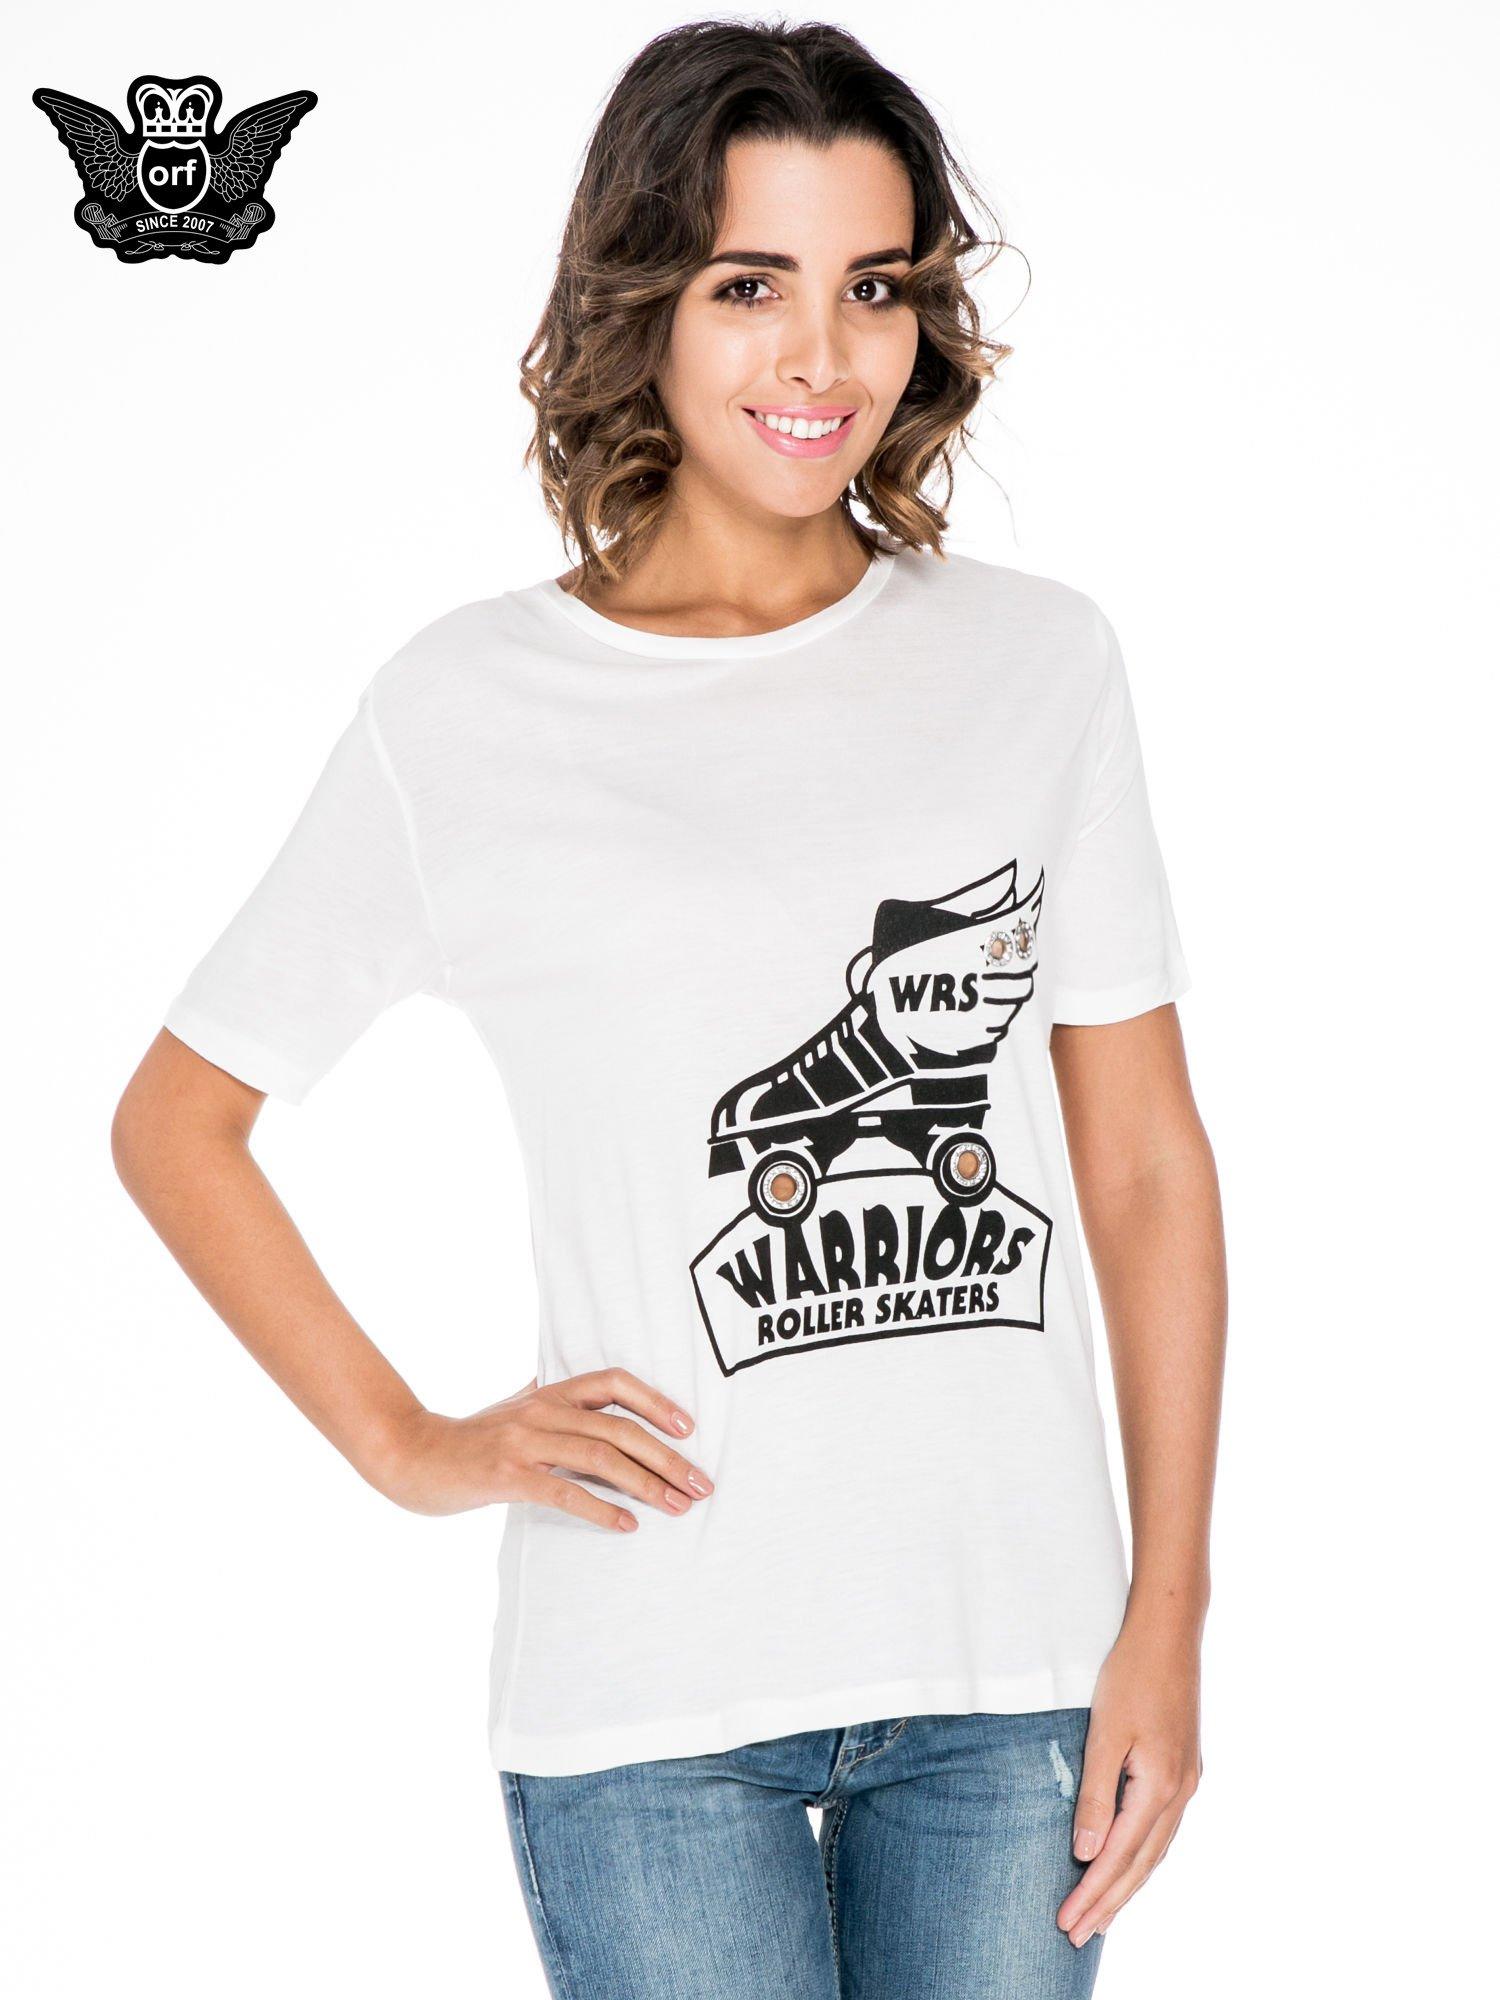 Biały t-shirt z napisem WARRIORS ROLLER SKATERS                                  zdj.                                  1